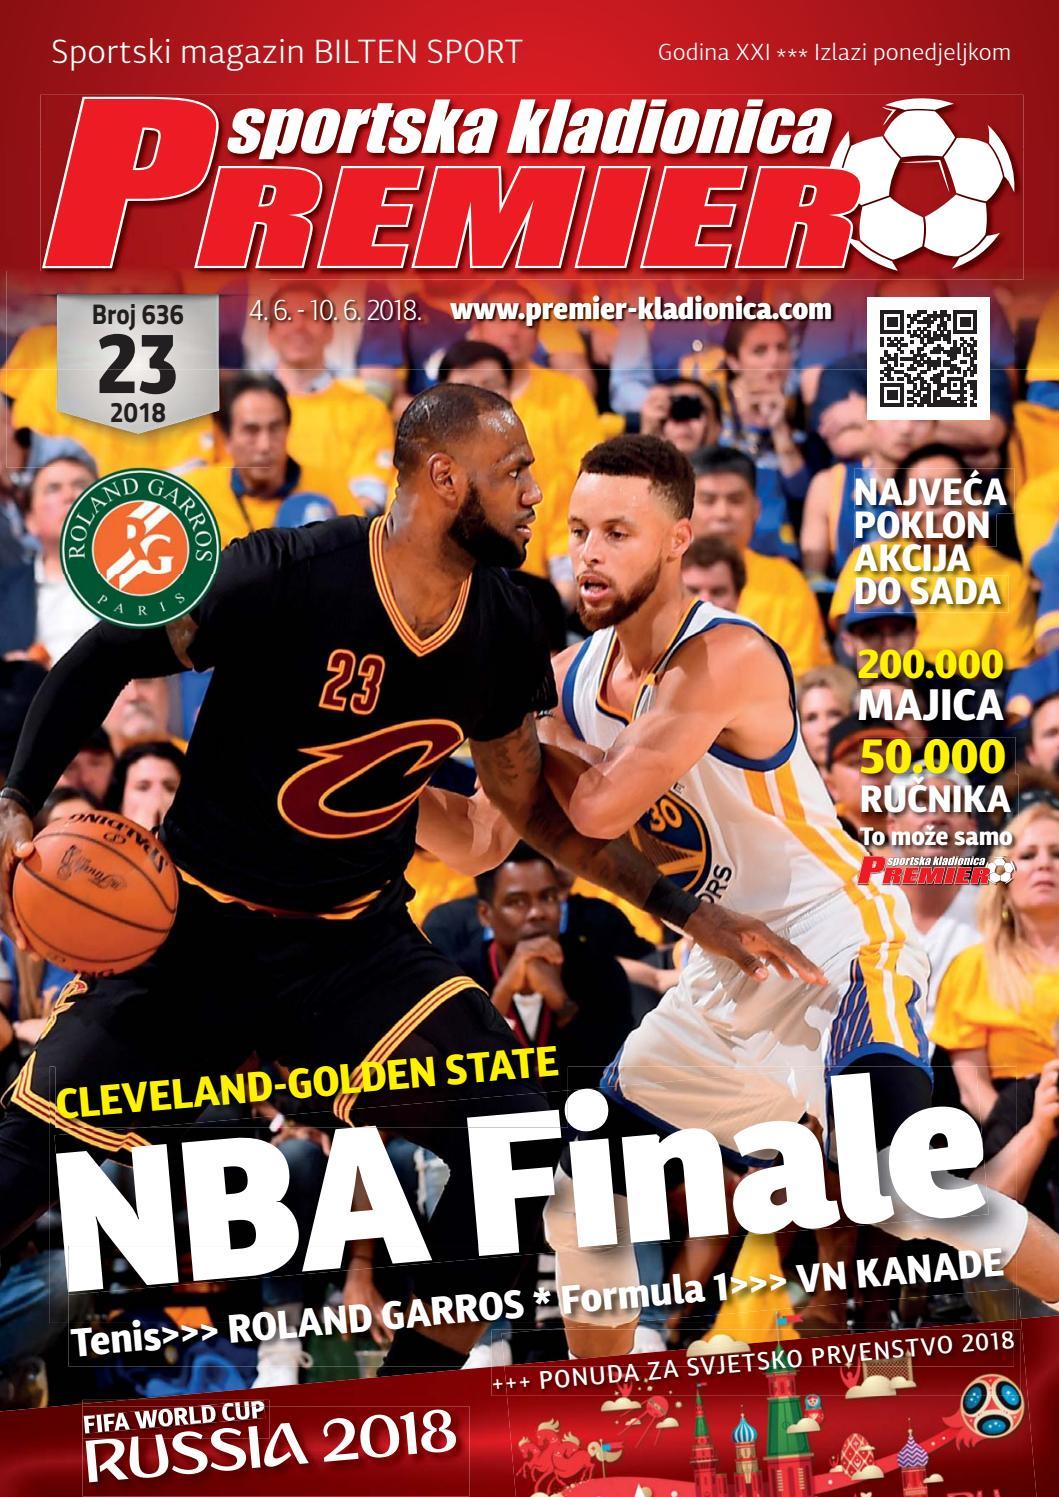 Izlazi u Clevelandu uk